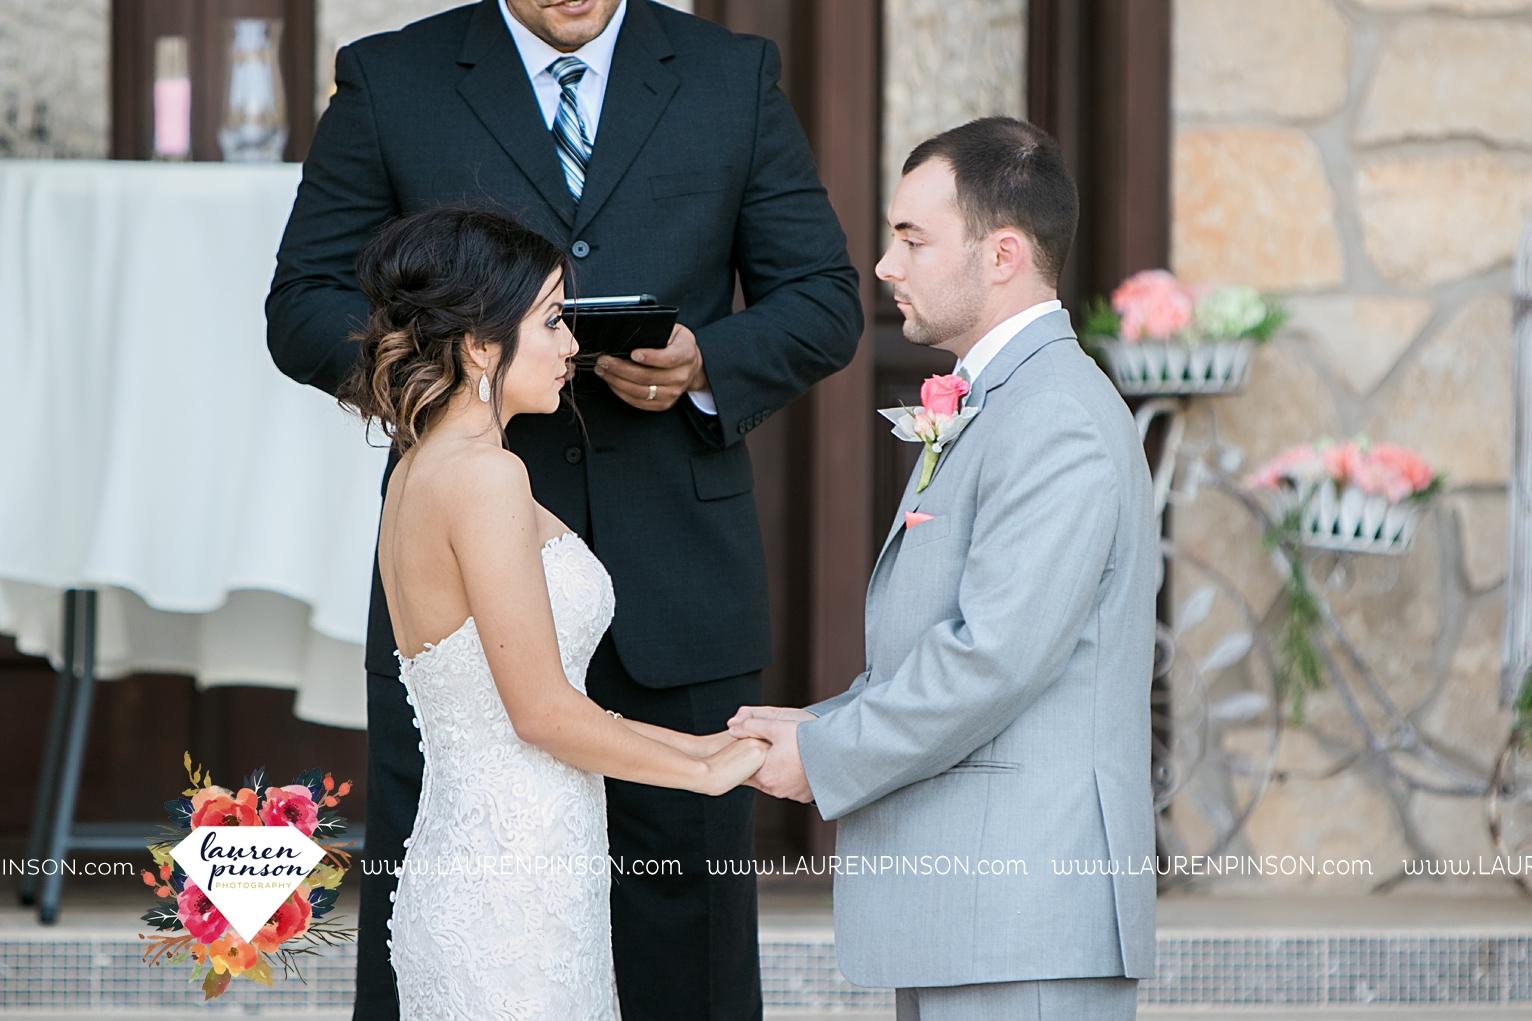 wichita-falls-wedding-nocona-comanche-rose-ranch-rustic-pink-gray-photography-00138.jpg